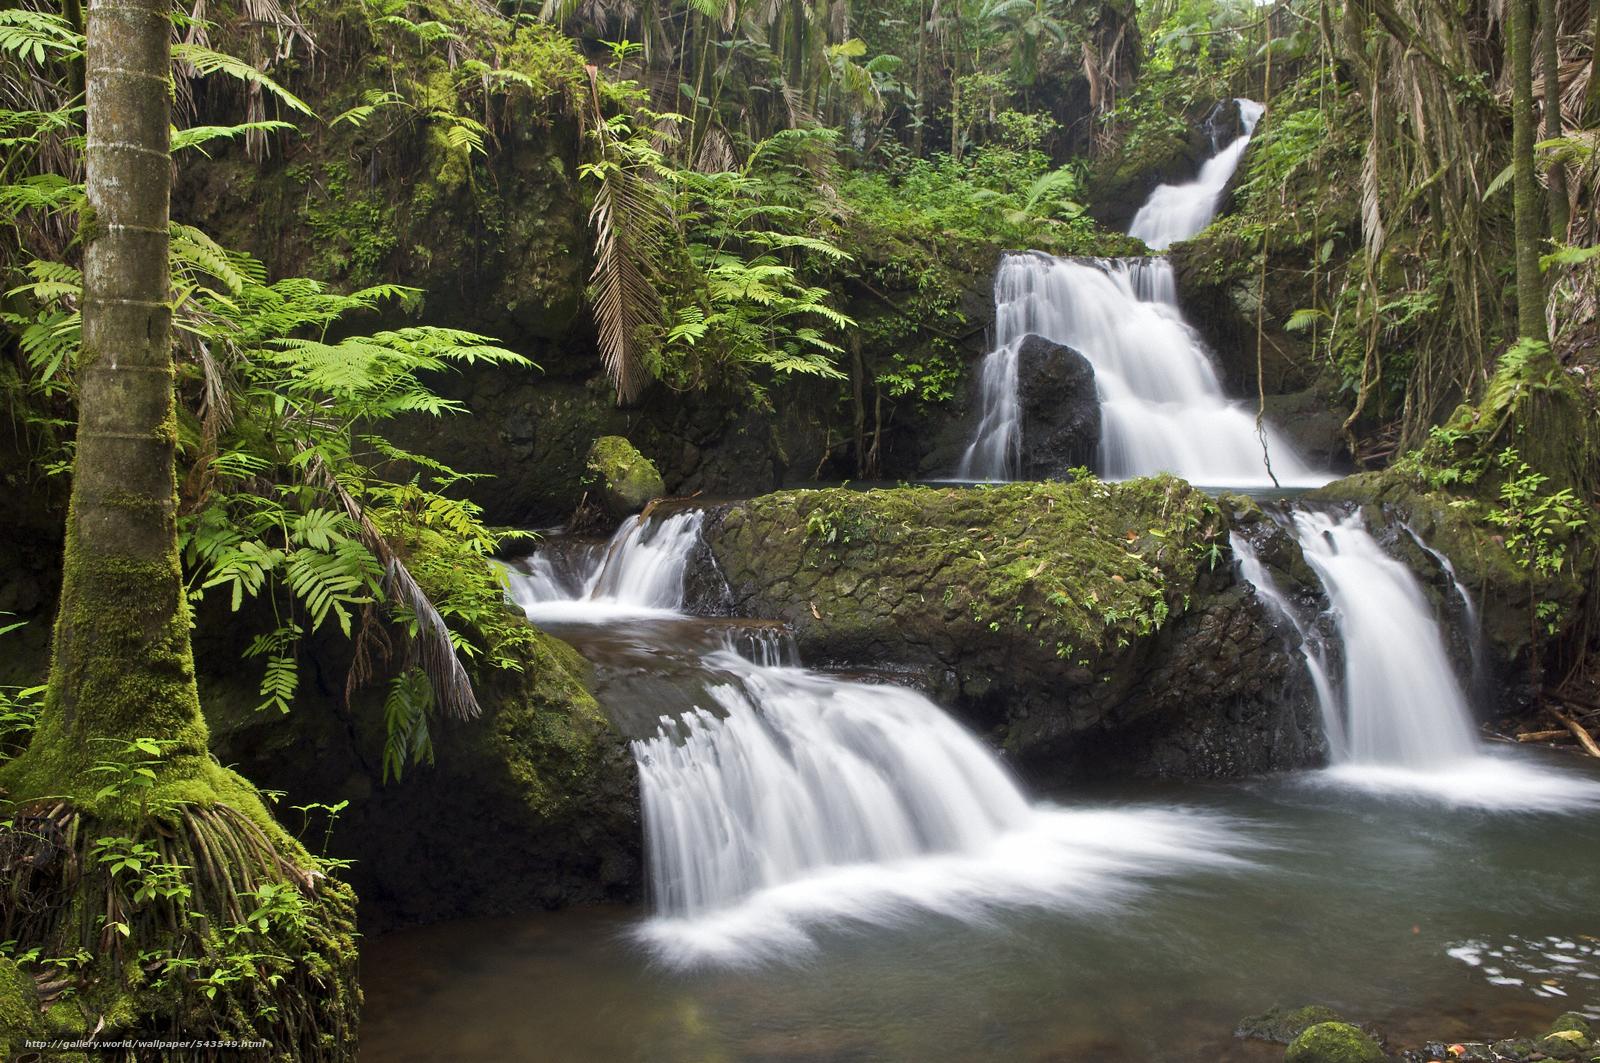 waterfalls animated wallpaper free download